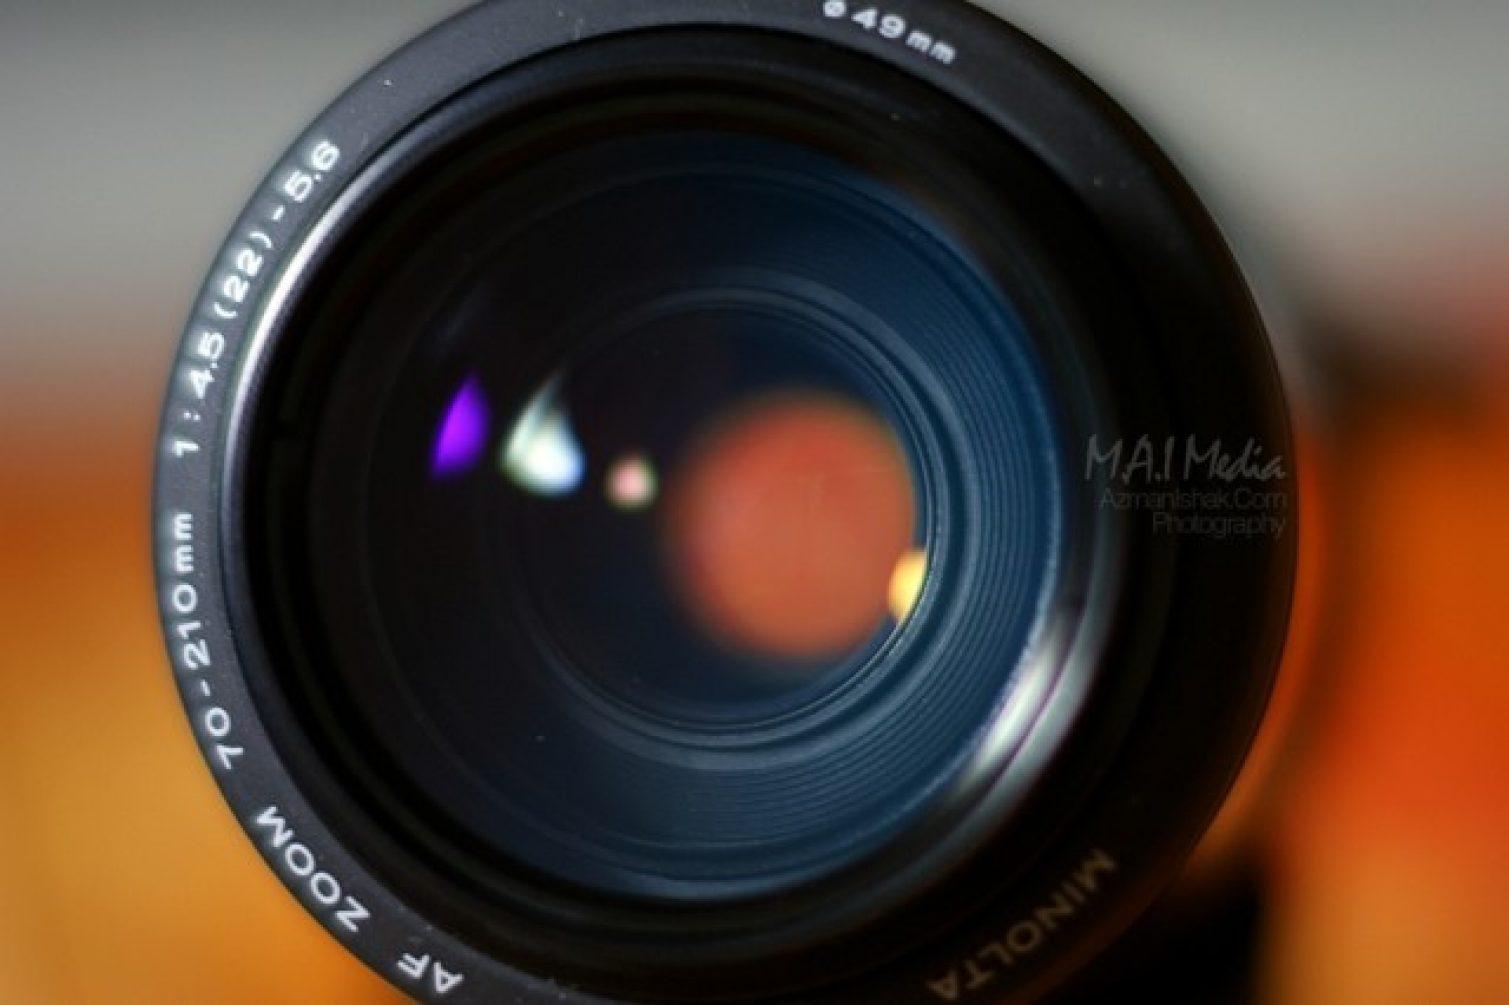 BigPicture: Minolta 70-210mm AF 4.5-5.6